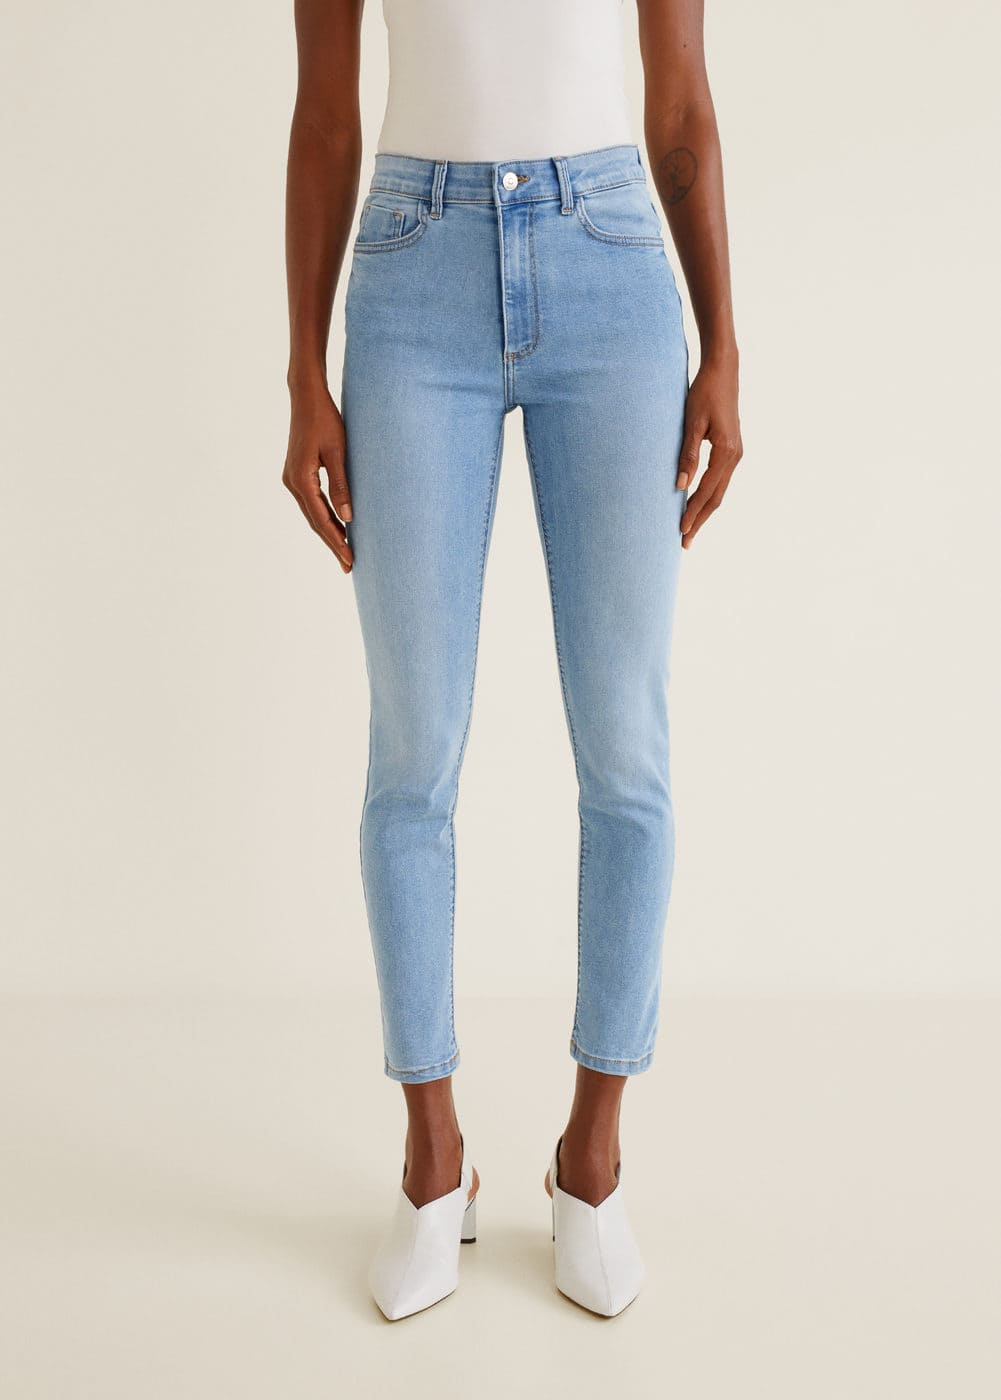 Women/'s High Waist Jeans Size 6 Mango Noa Sky Blue Skinny Jeans